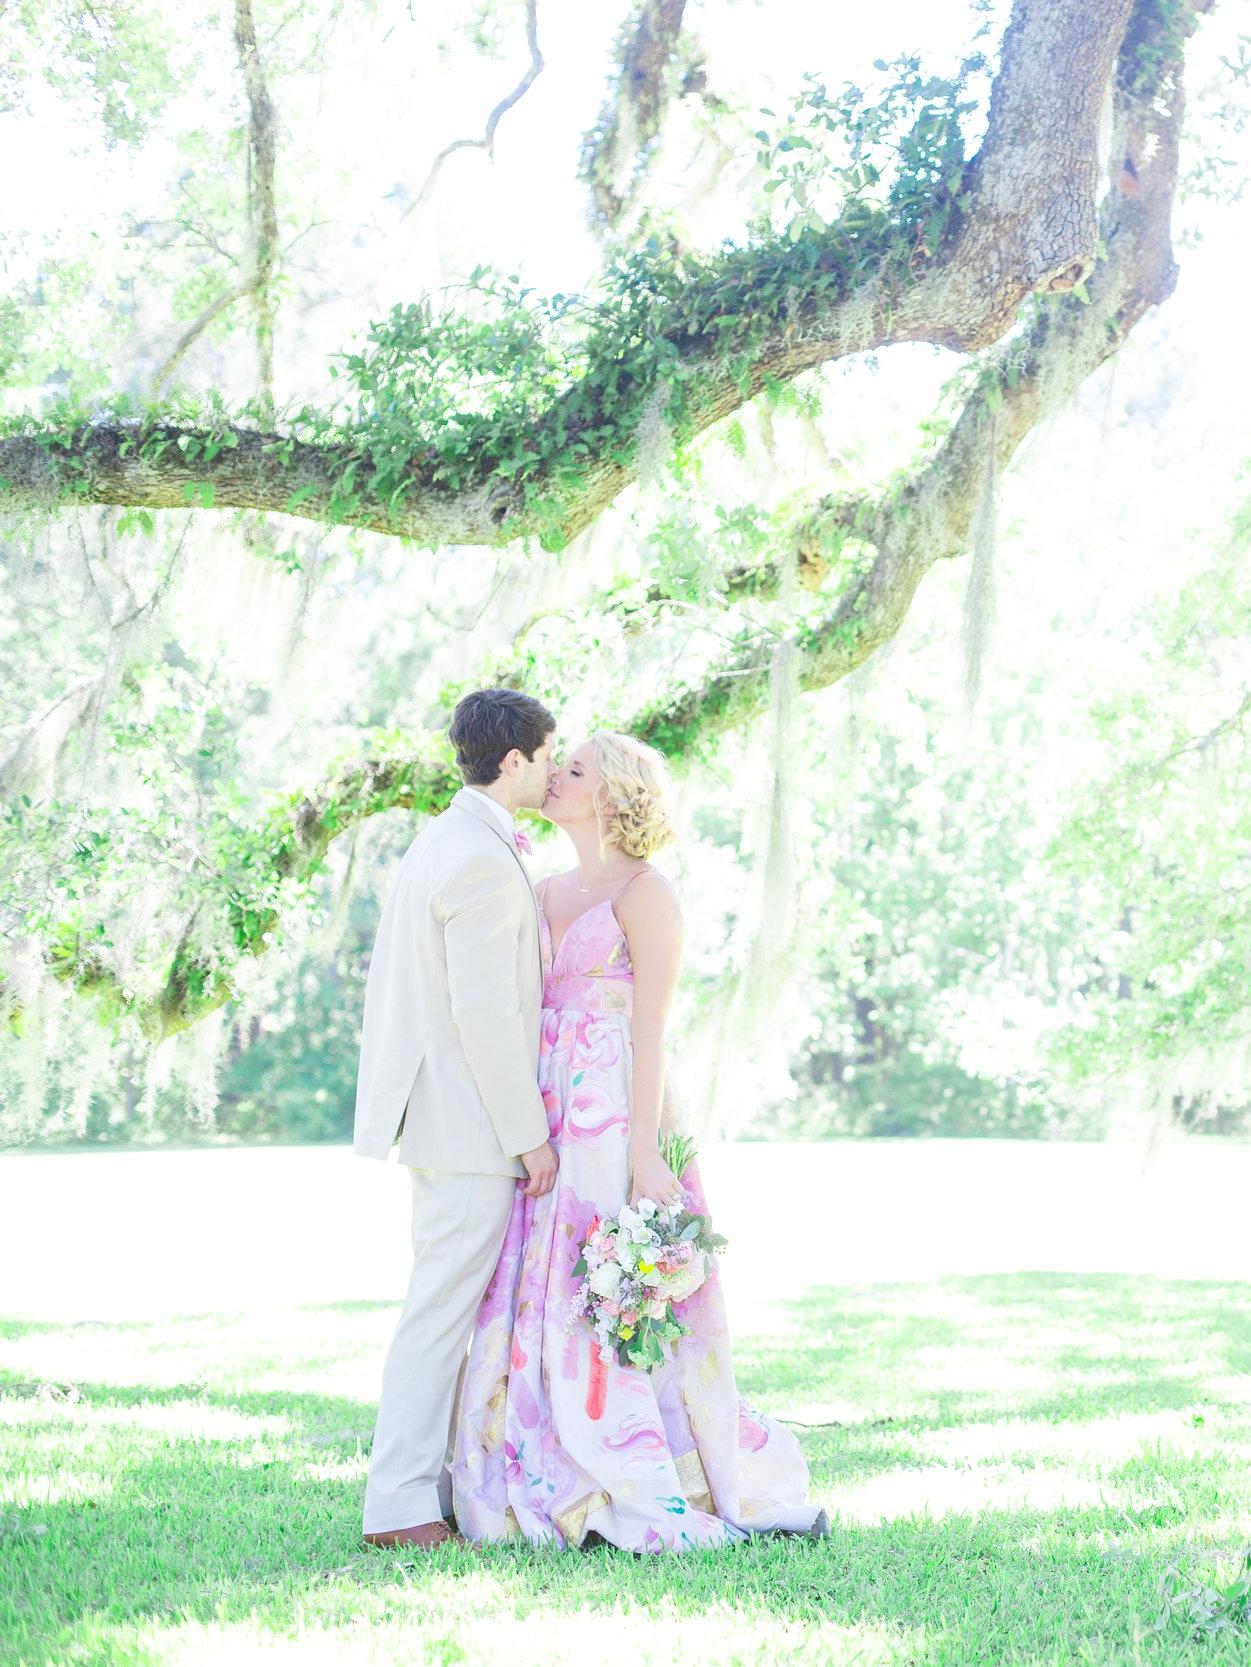 Hilleary Photography  //  Hilton Head wedding vendors  //  A Lowcountry Wedding Magazine & Blog